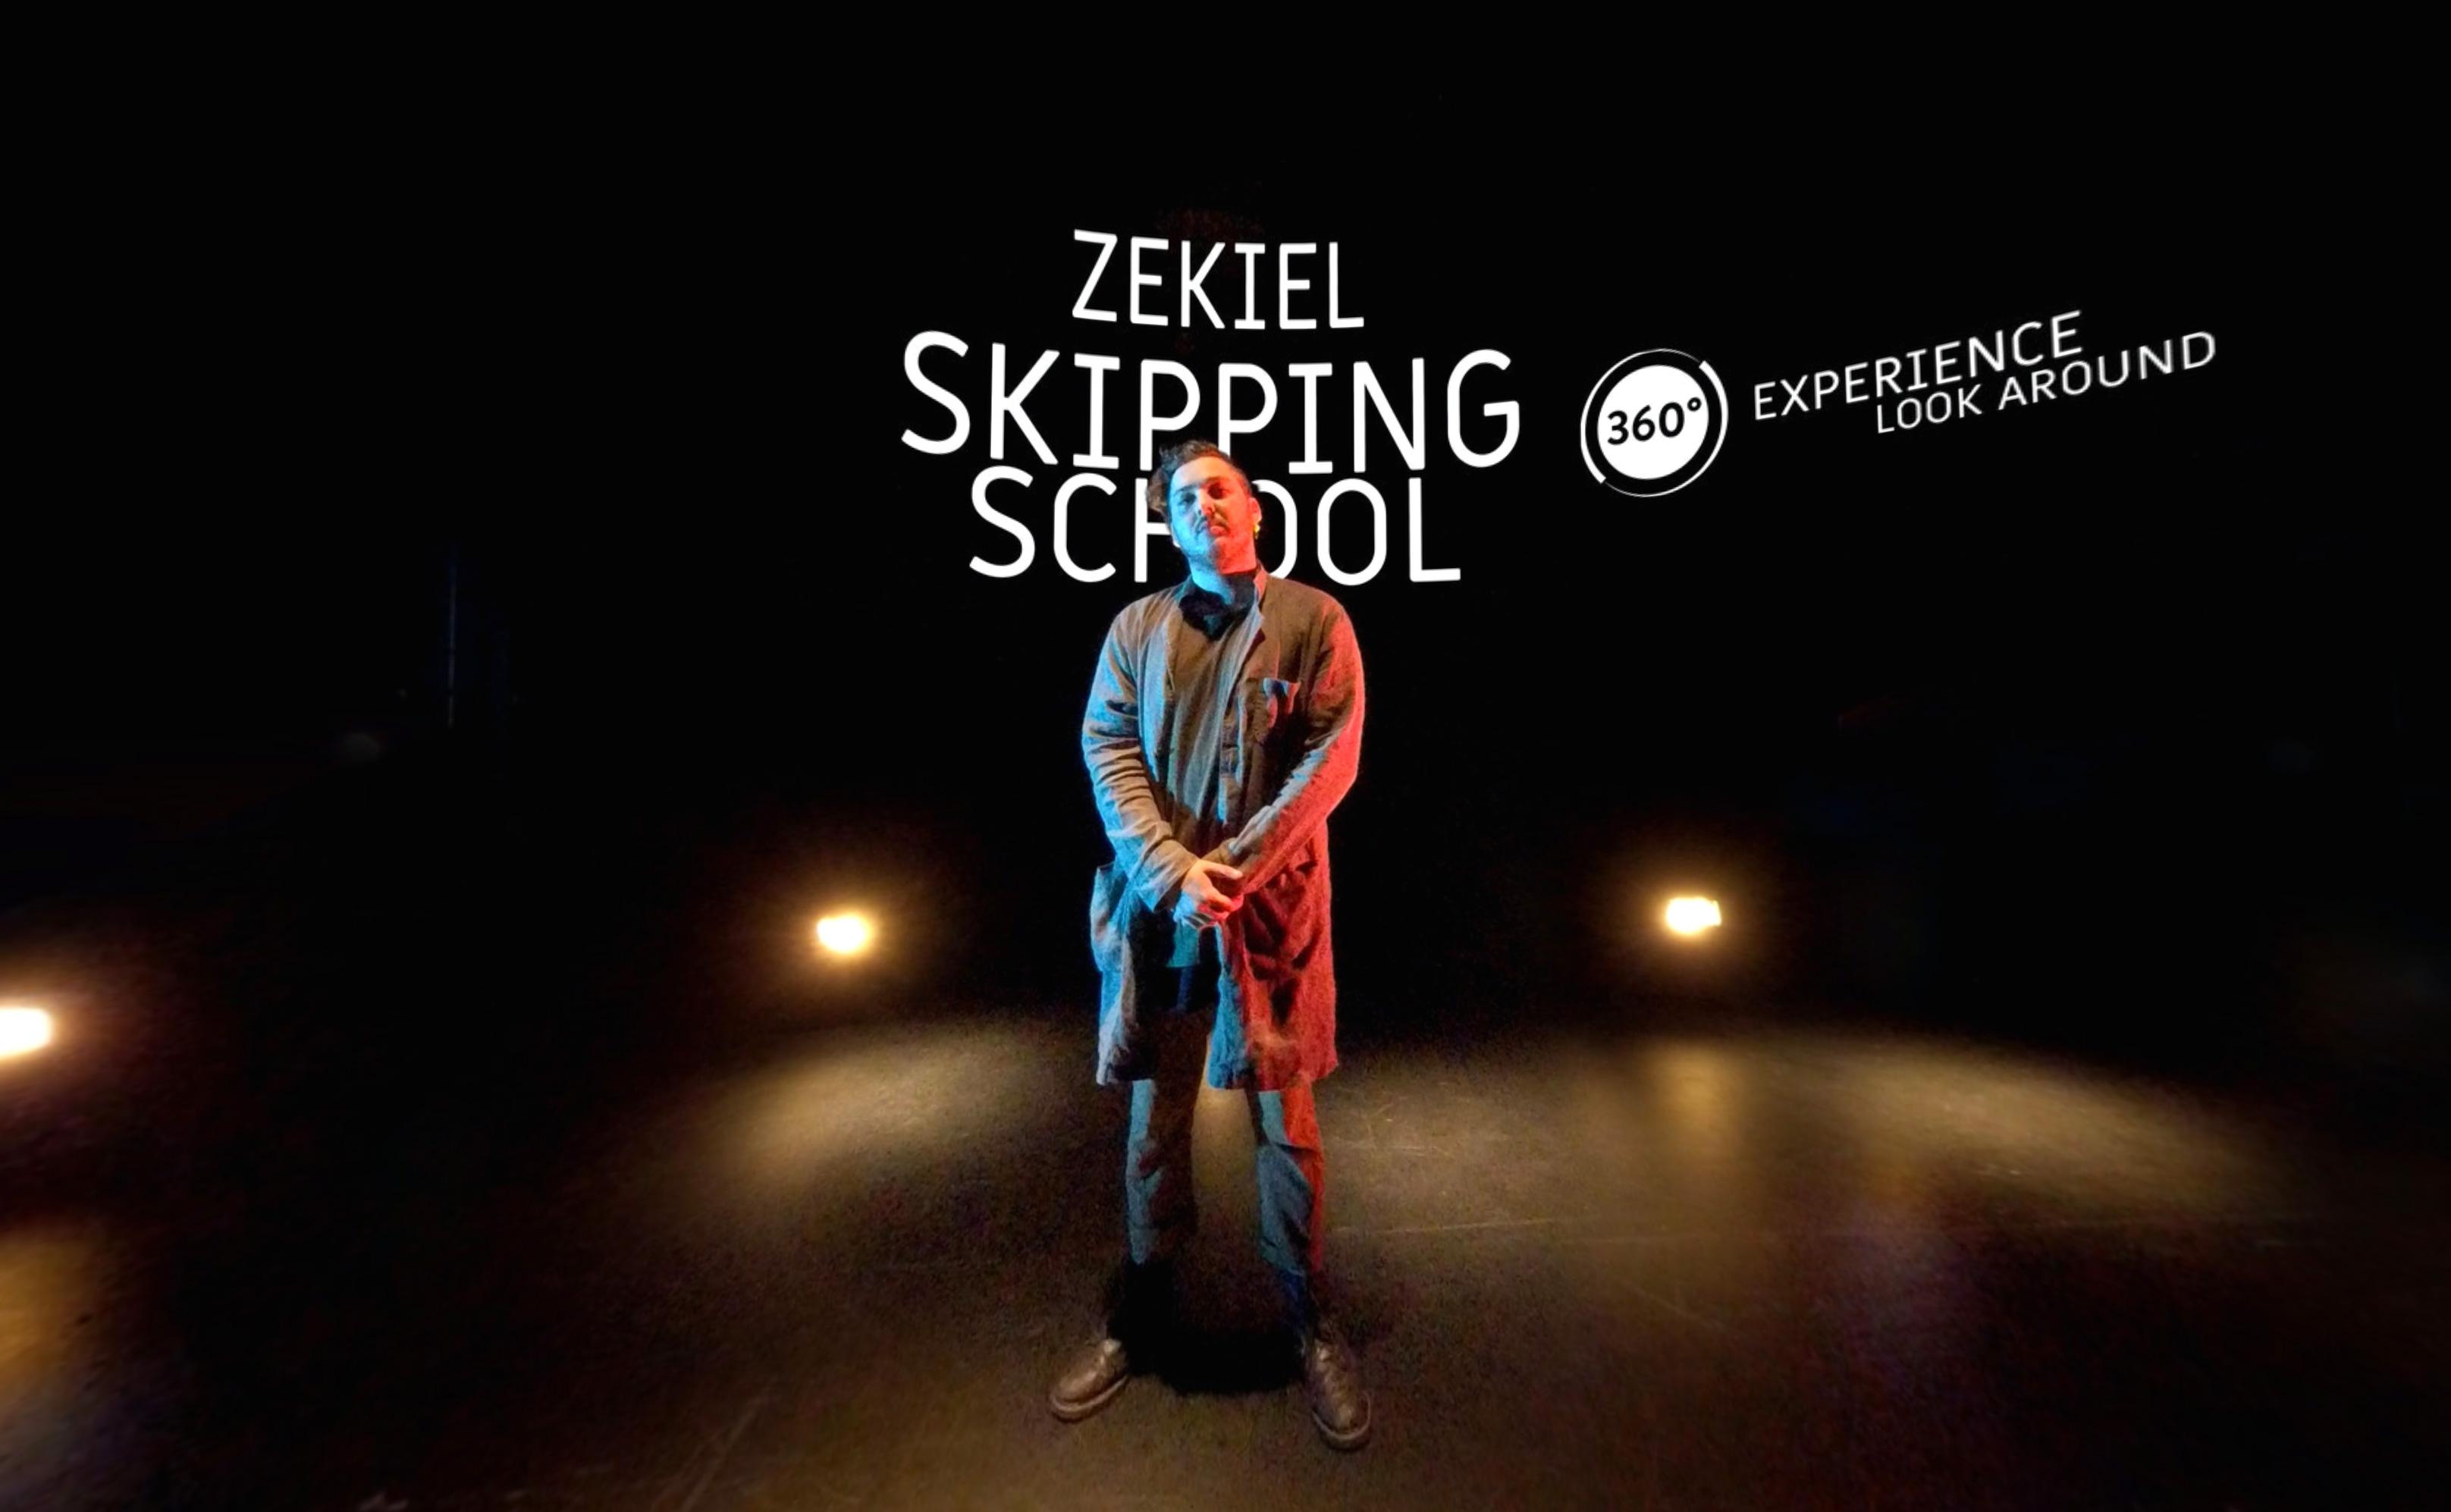 Zekiel - Universal Music